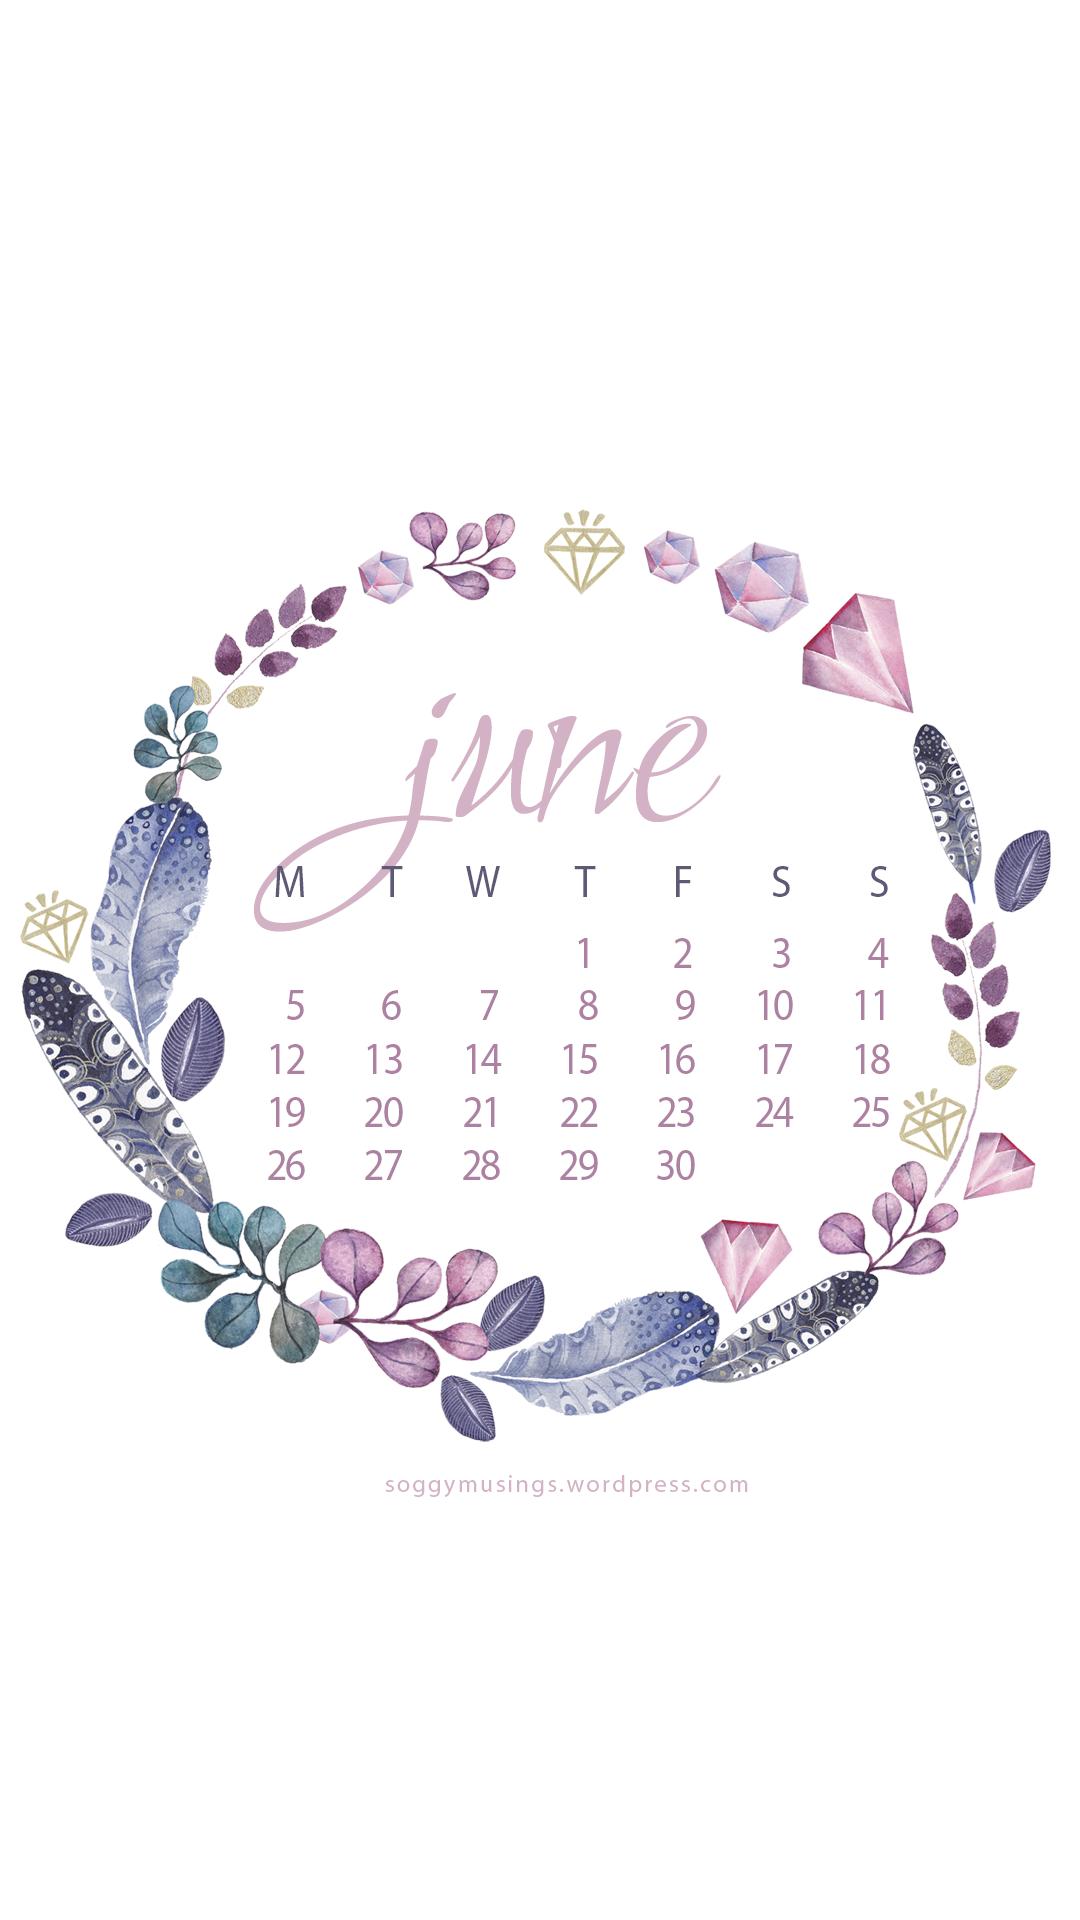 June Calendar Background : June wallpaper calendars soggy musings